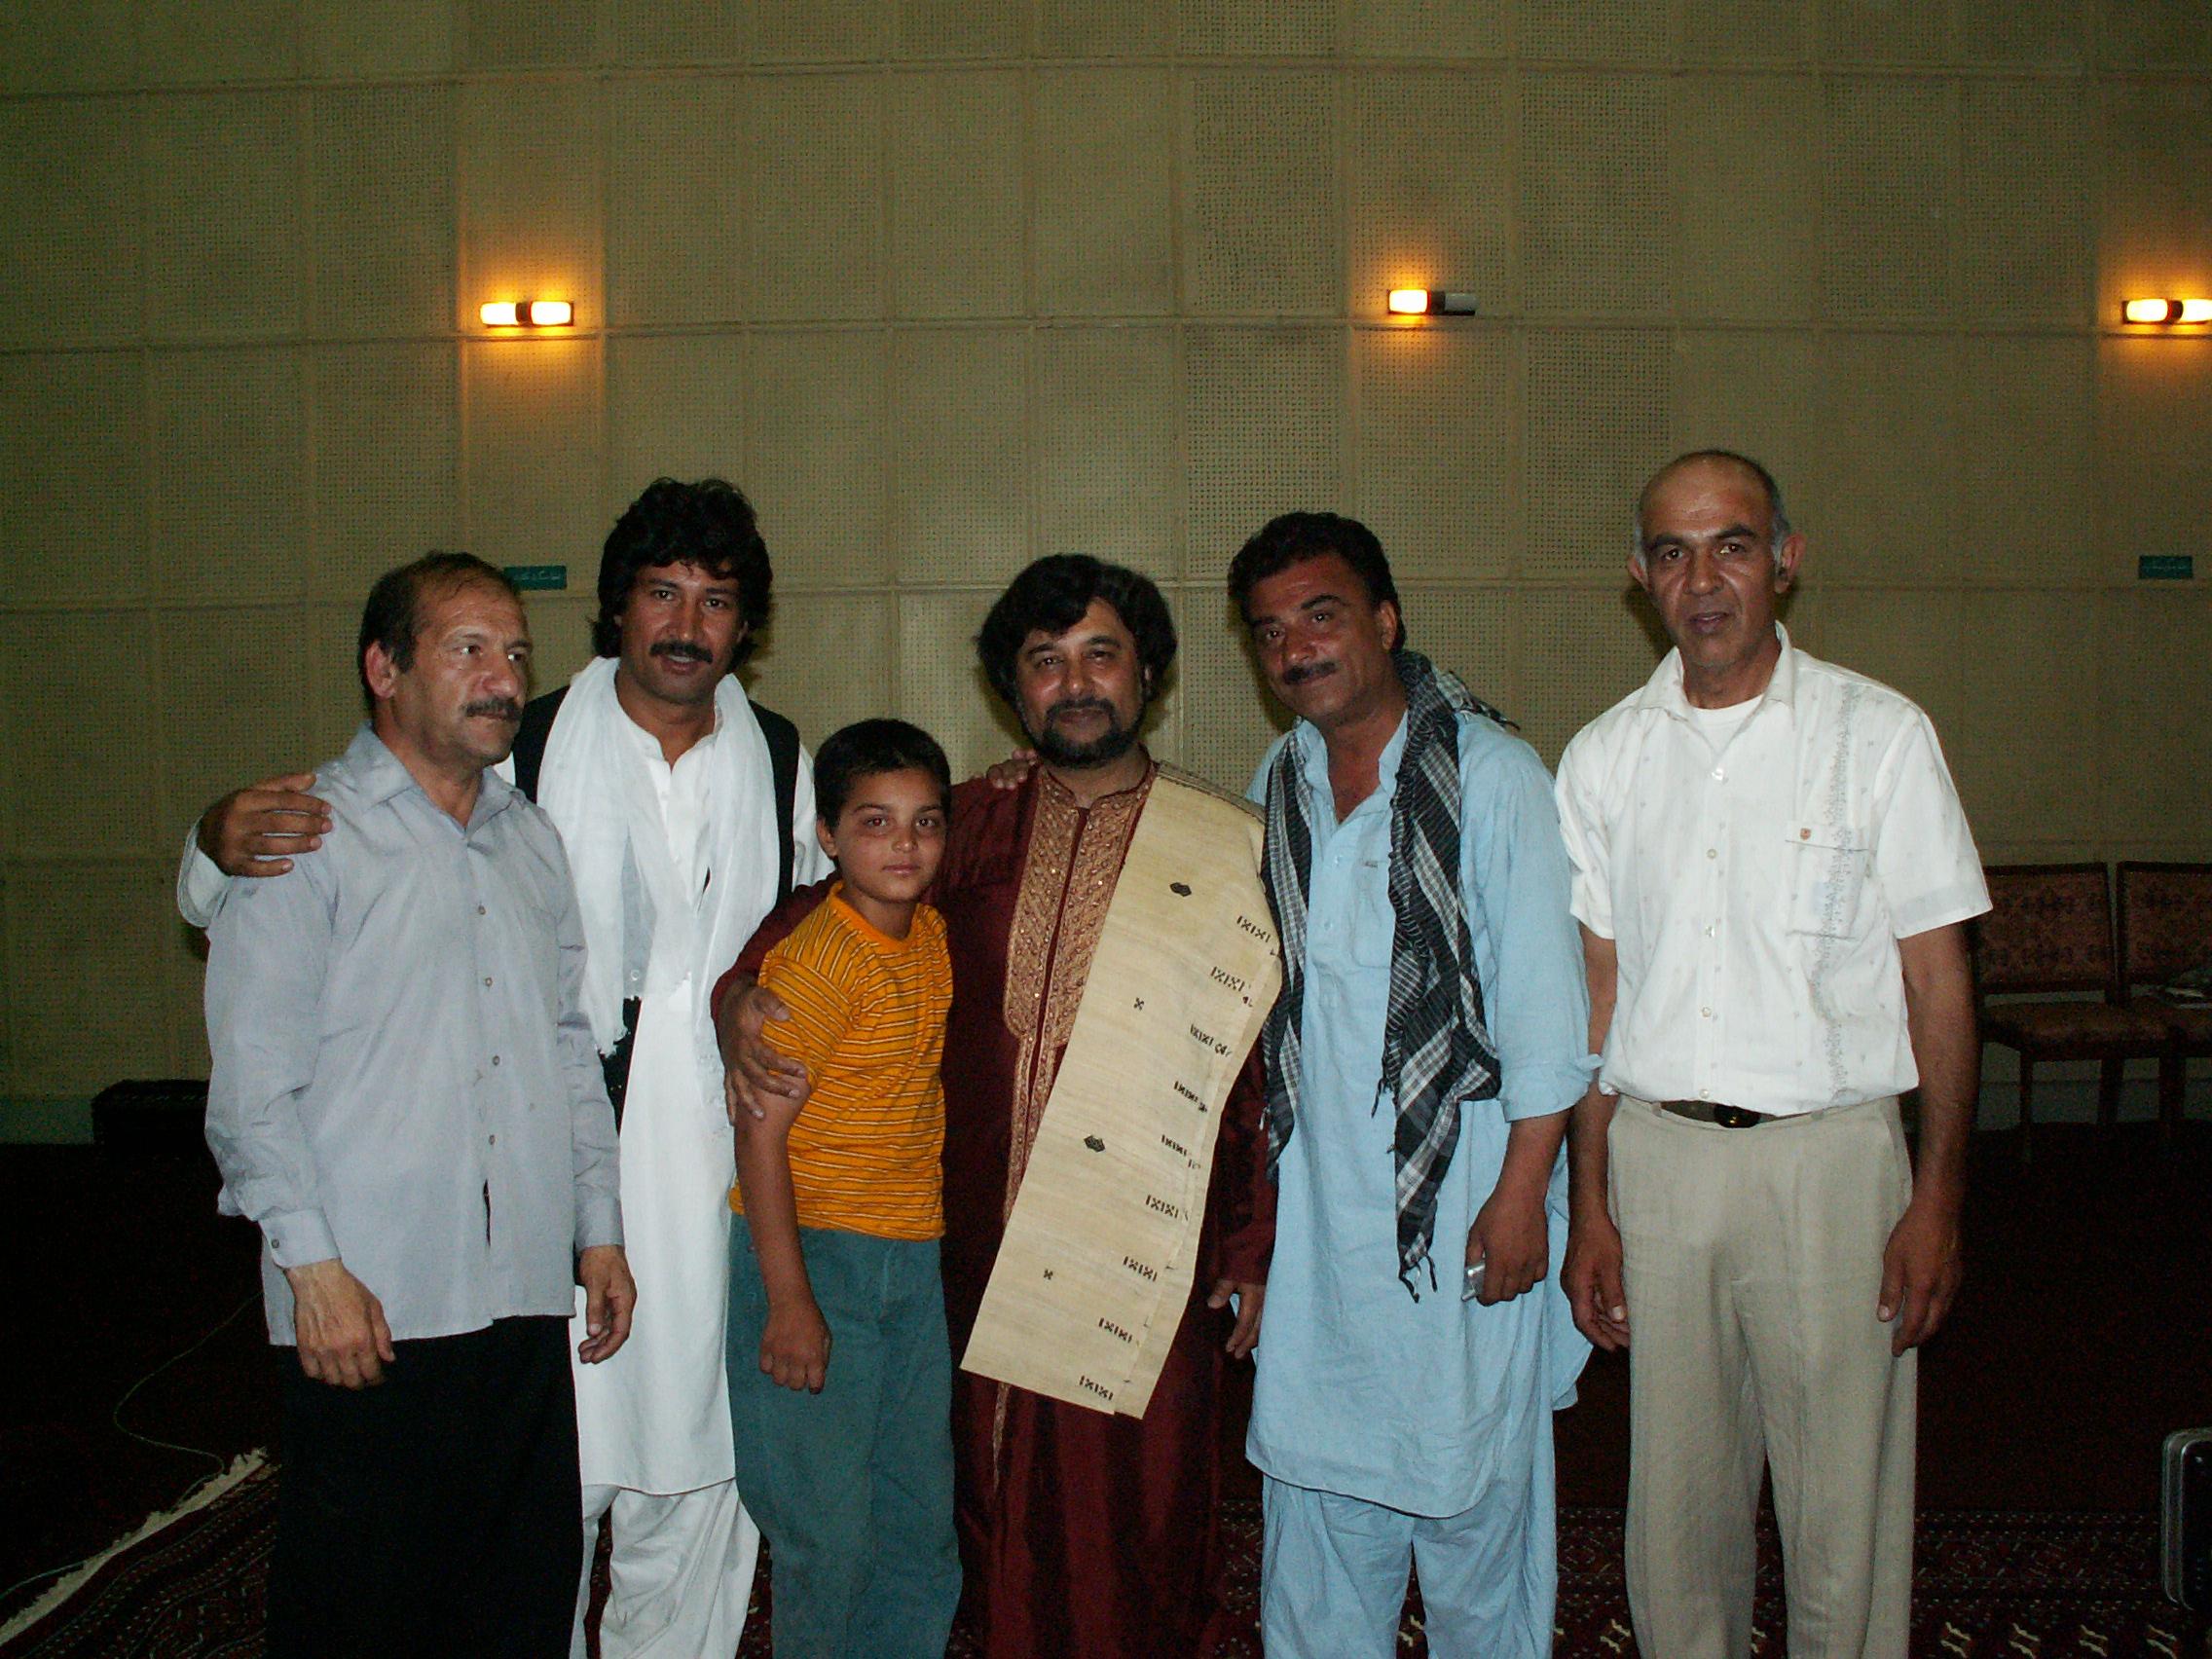 from-left---ud-tarekh-ud-suman-little-boy-samir-kharabadi-friend-and-faisal-arsala_4208542432_o.jpg